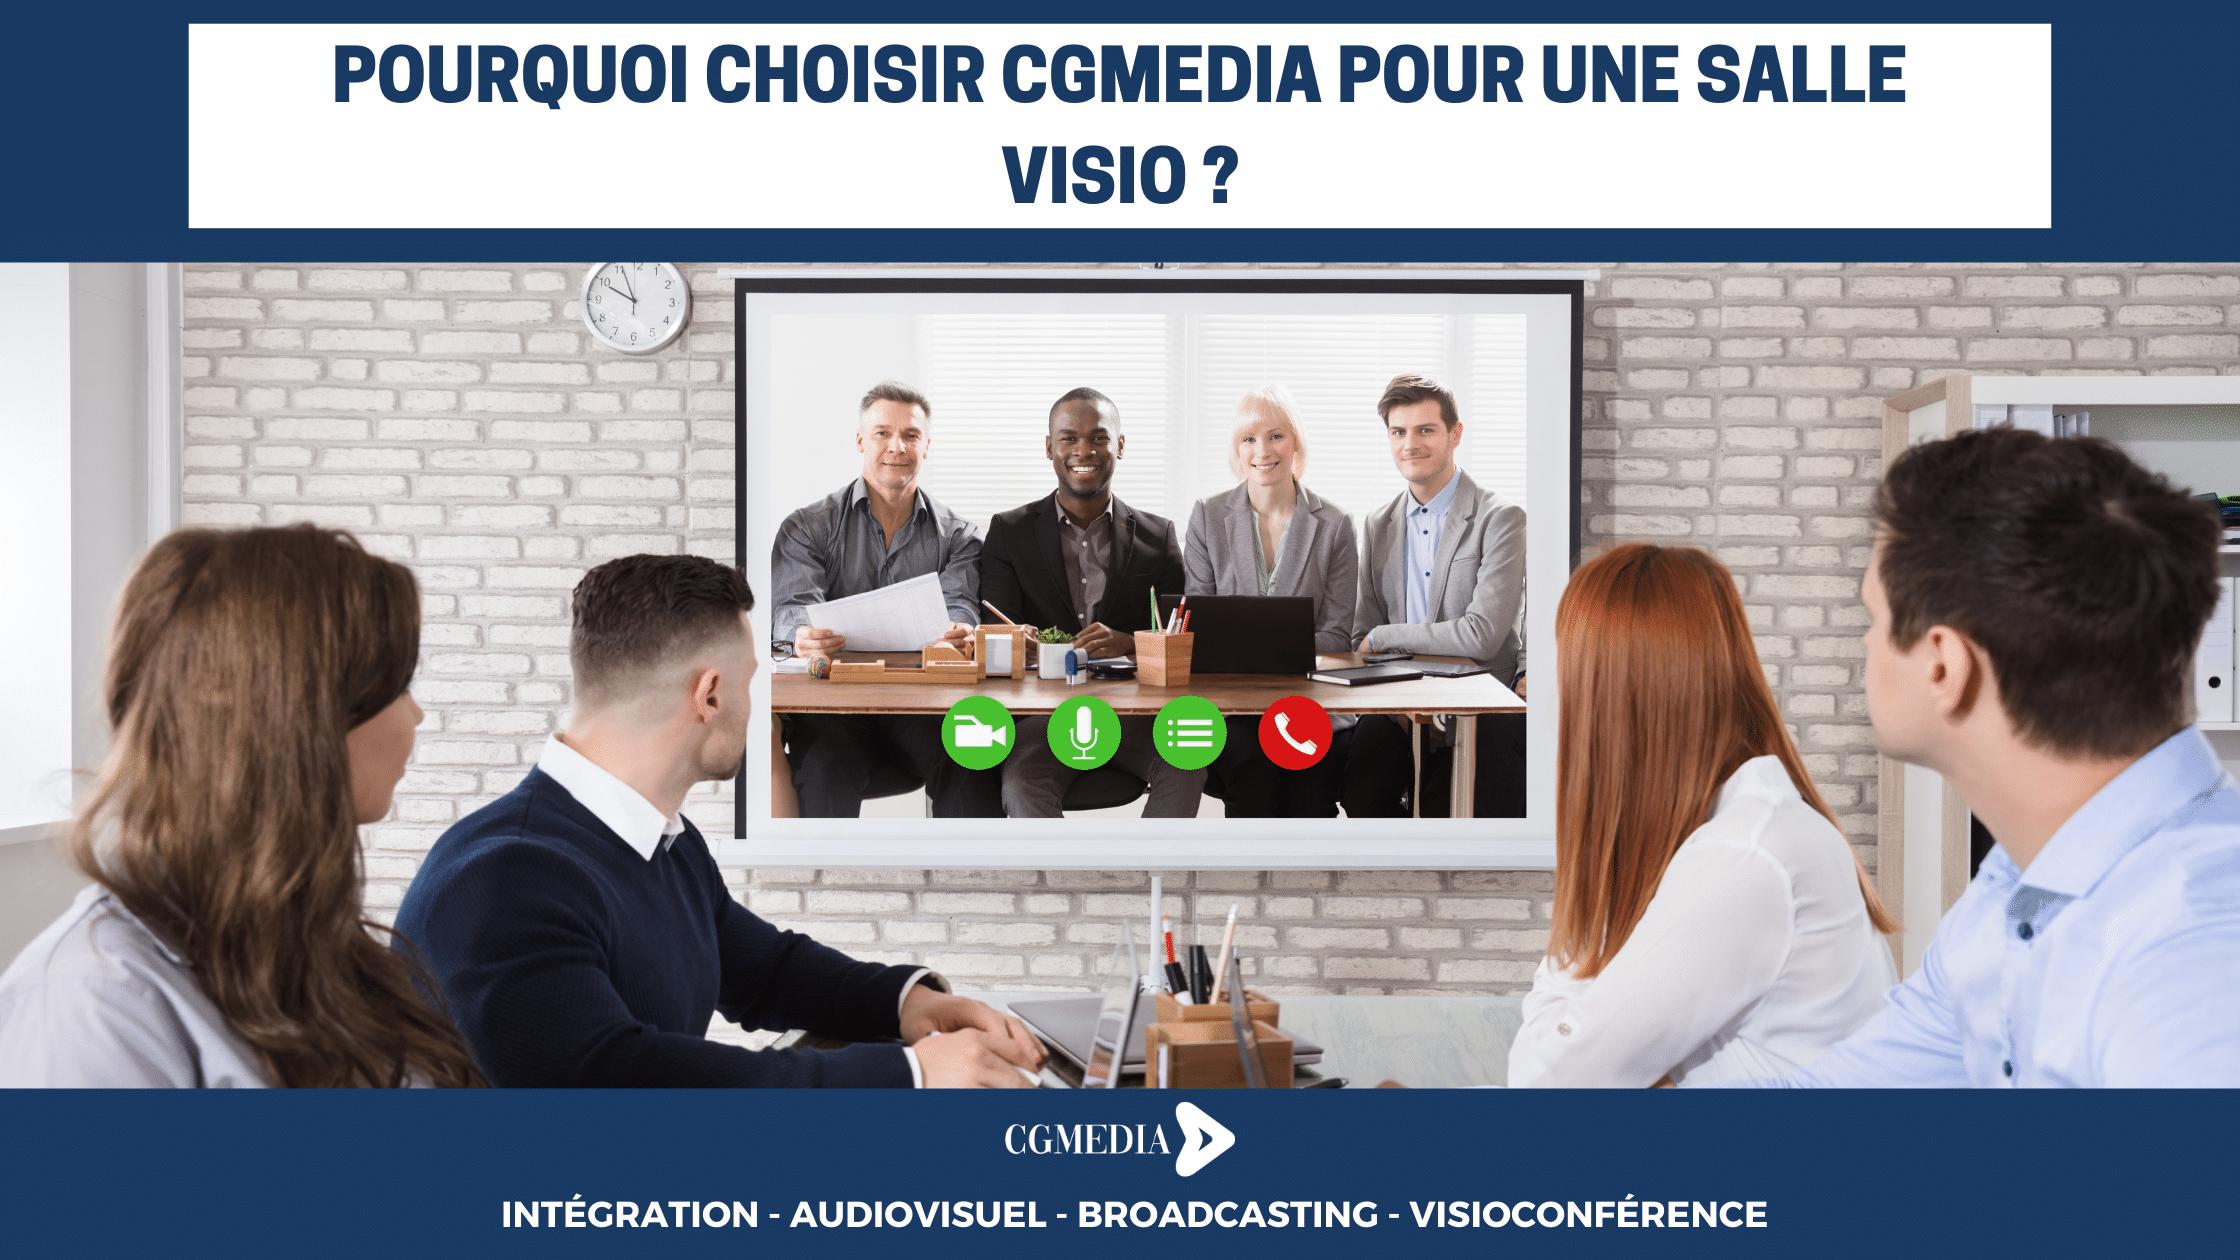 Pourquoi choisir CGMEDIA pour une salle visio en Bretagne